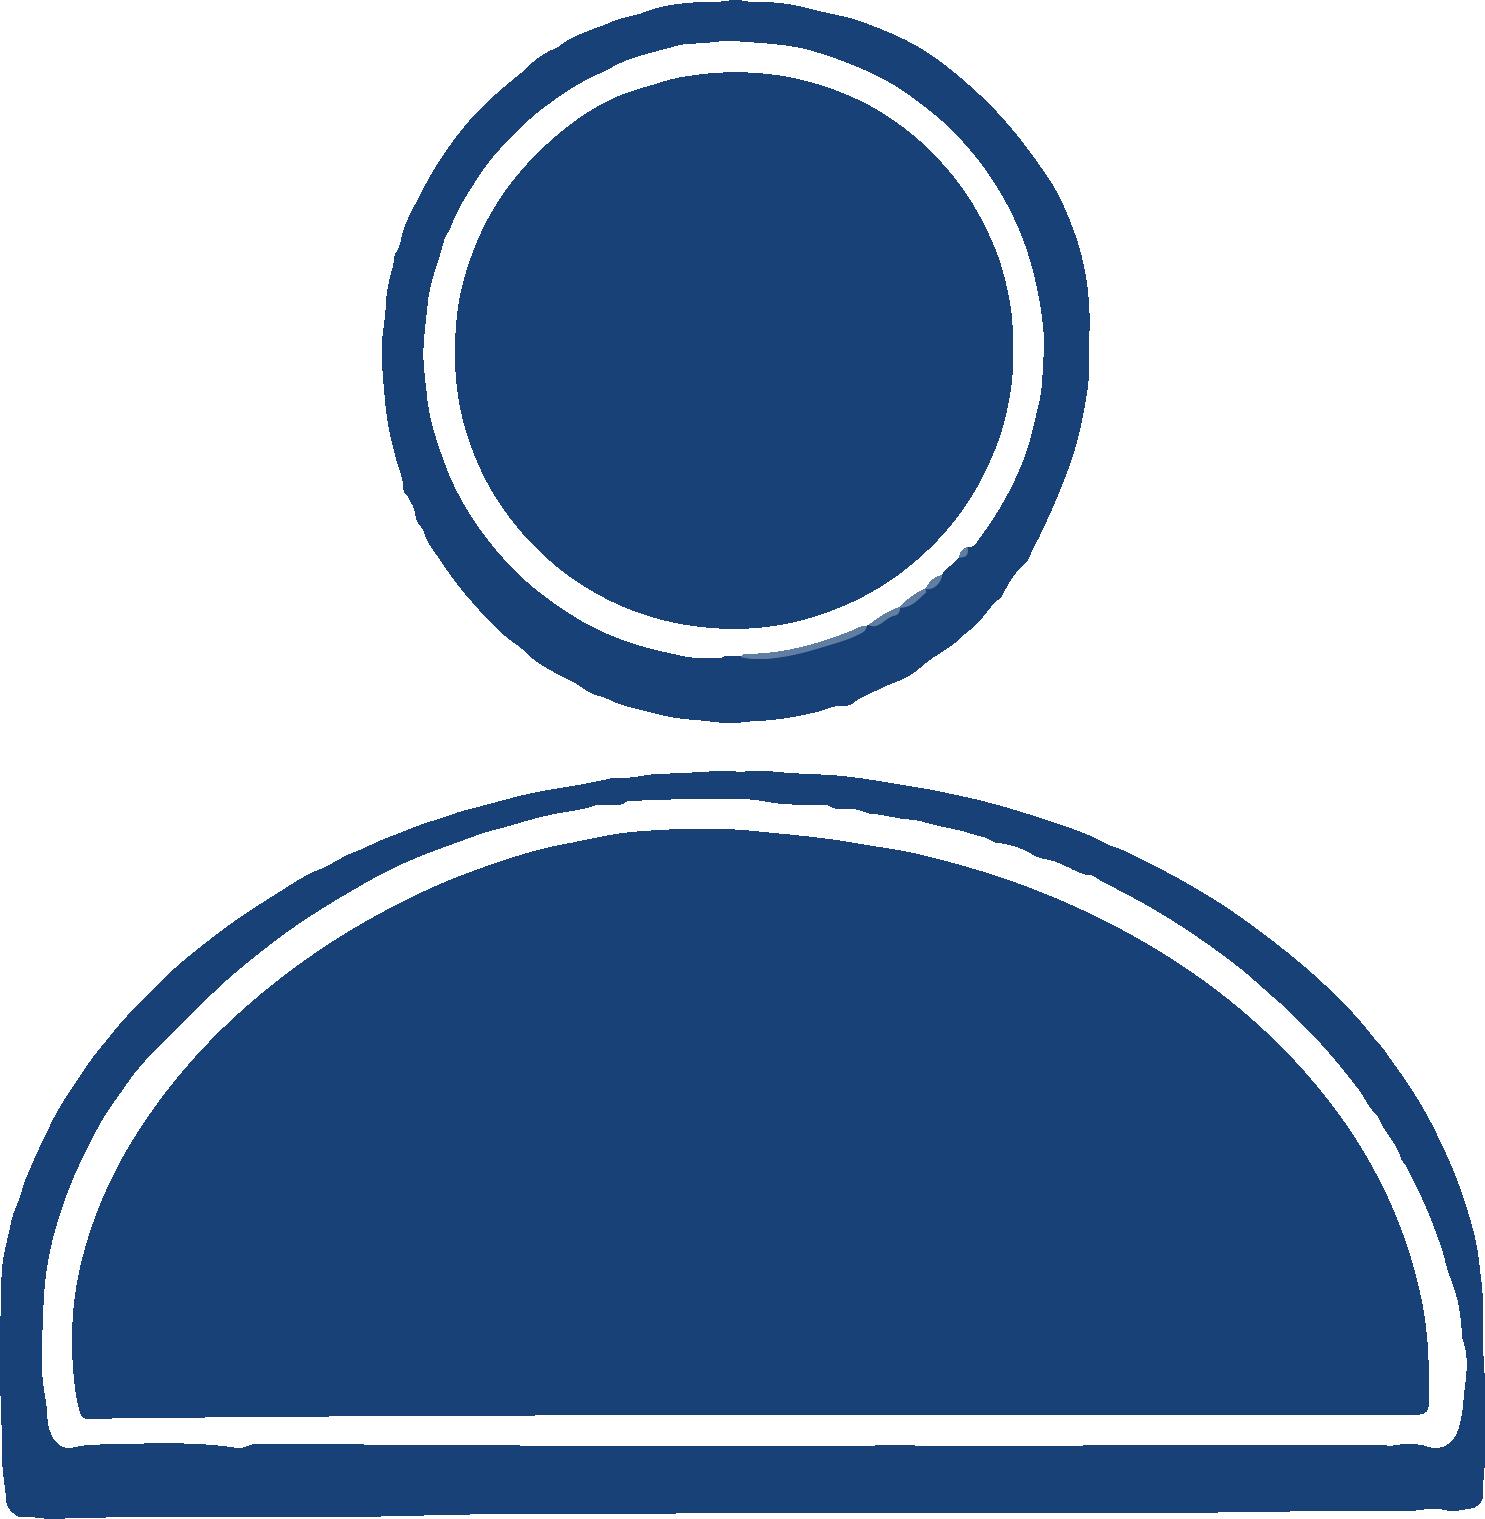 Data subject icon